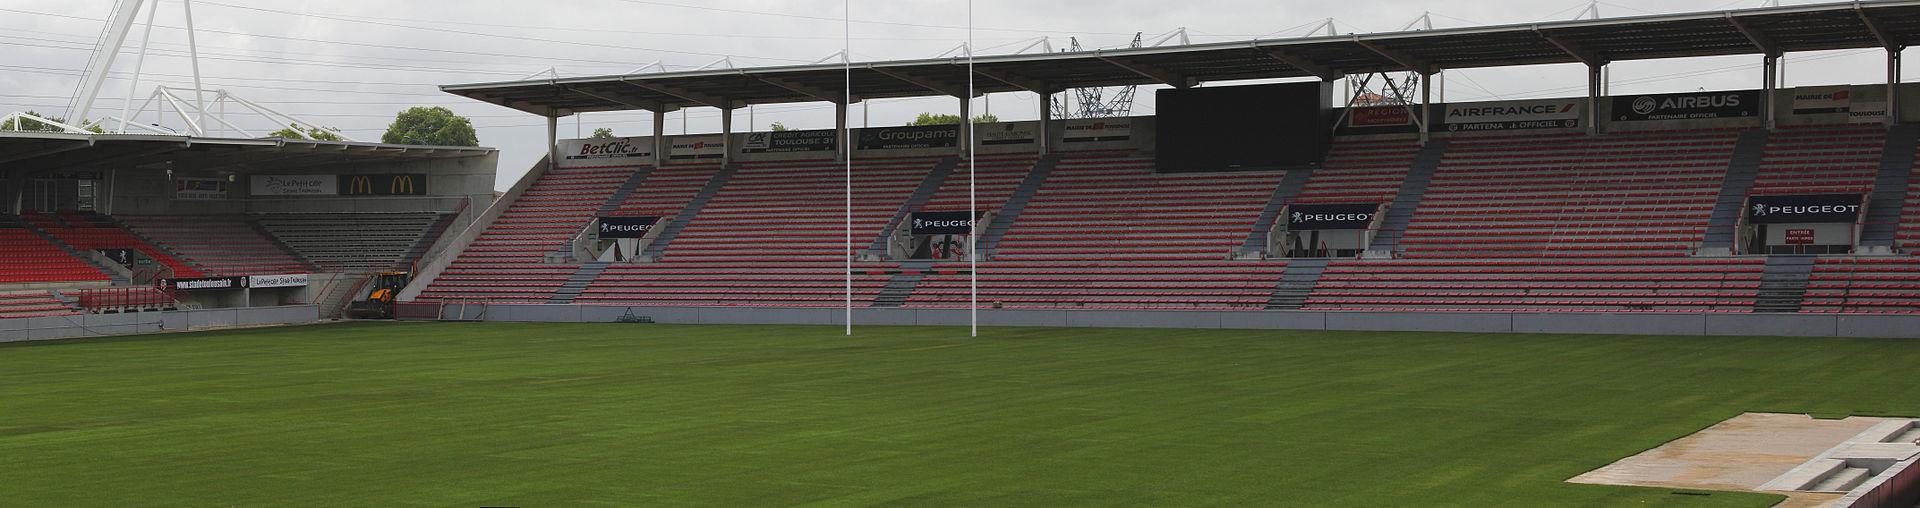 Stade Ernest Vallon Stade Toulousain